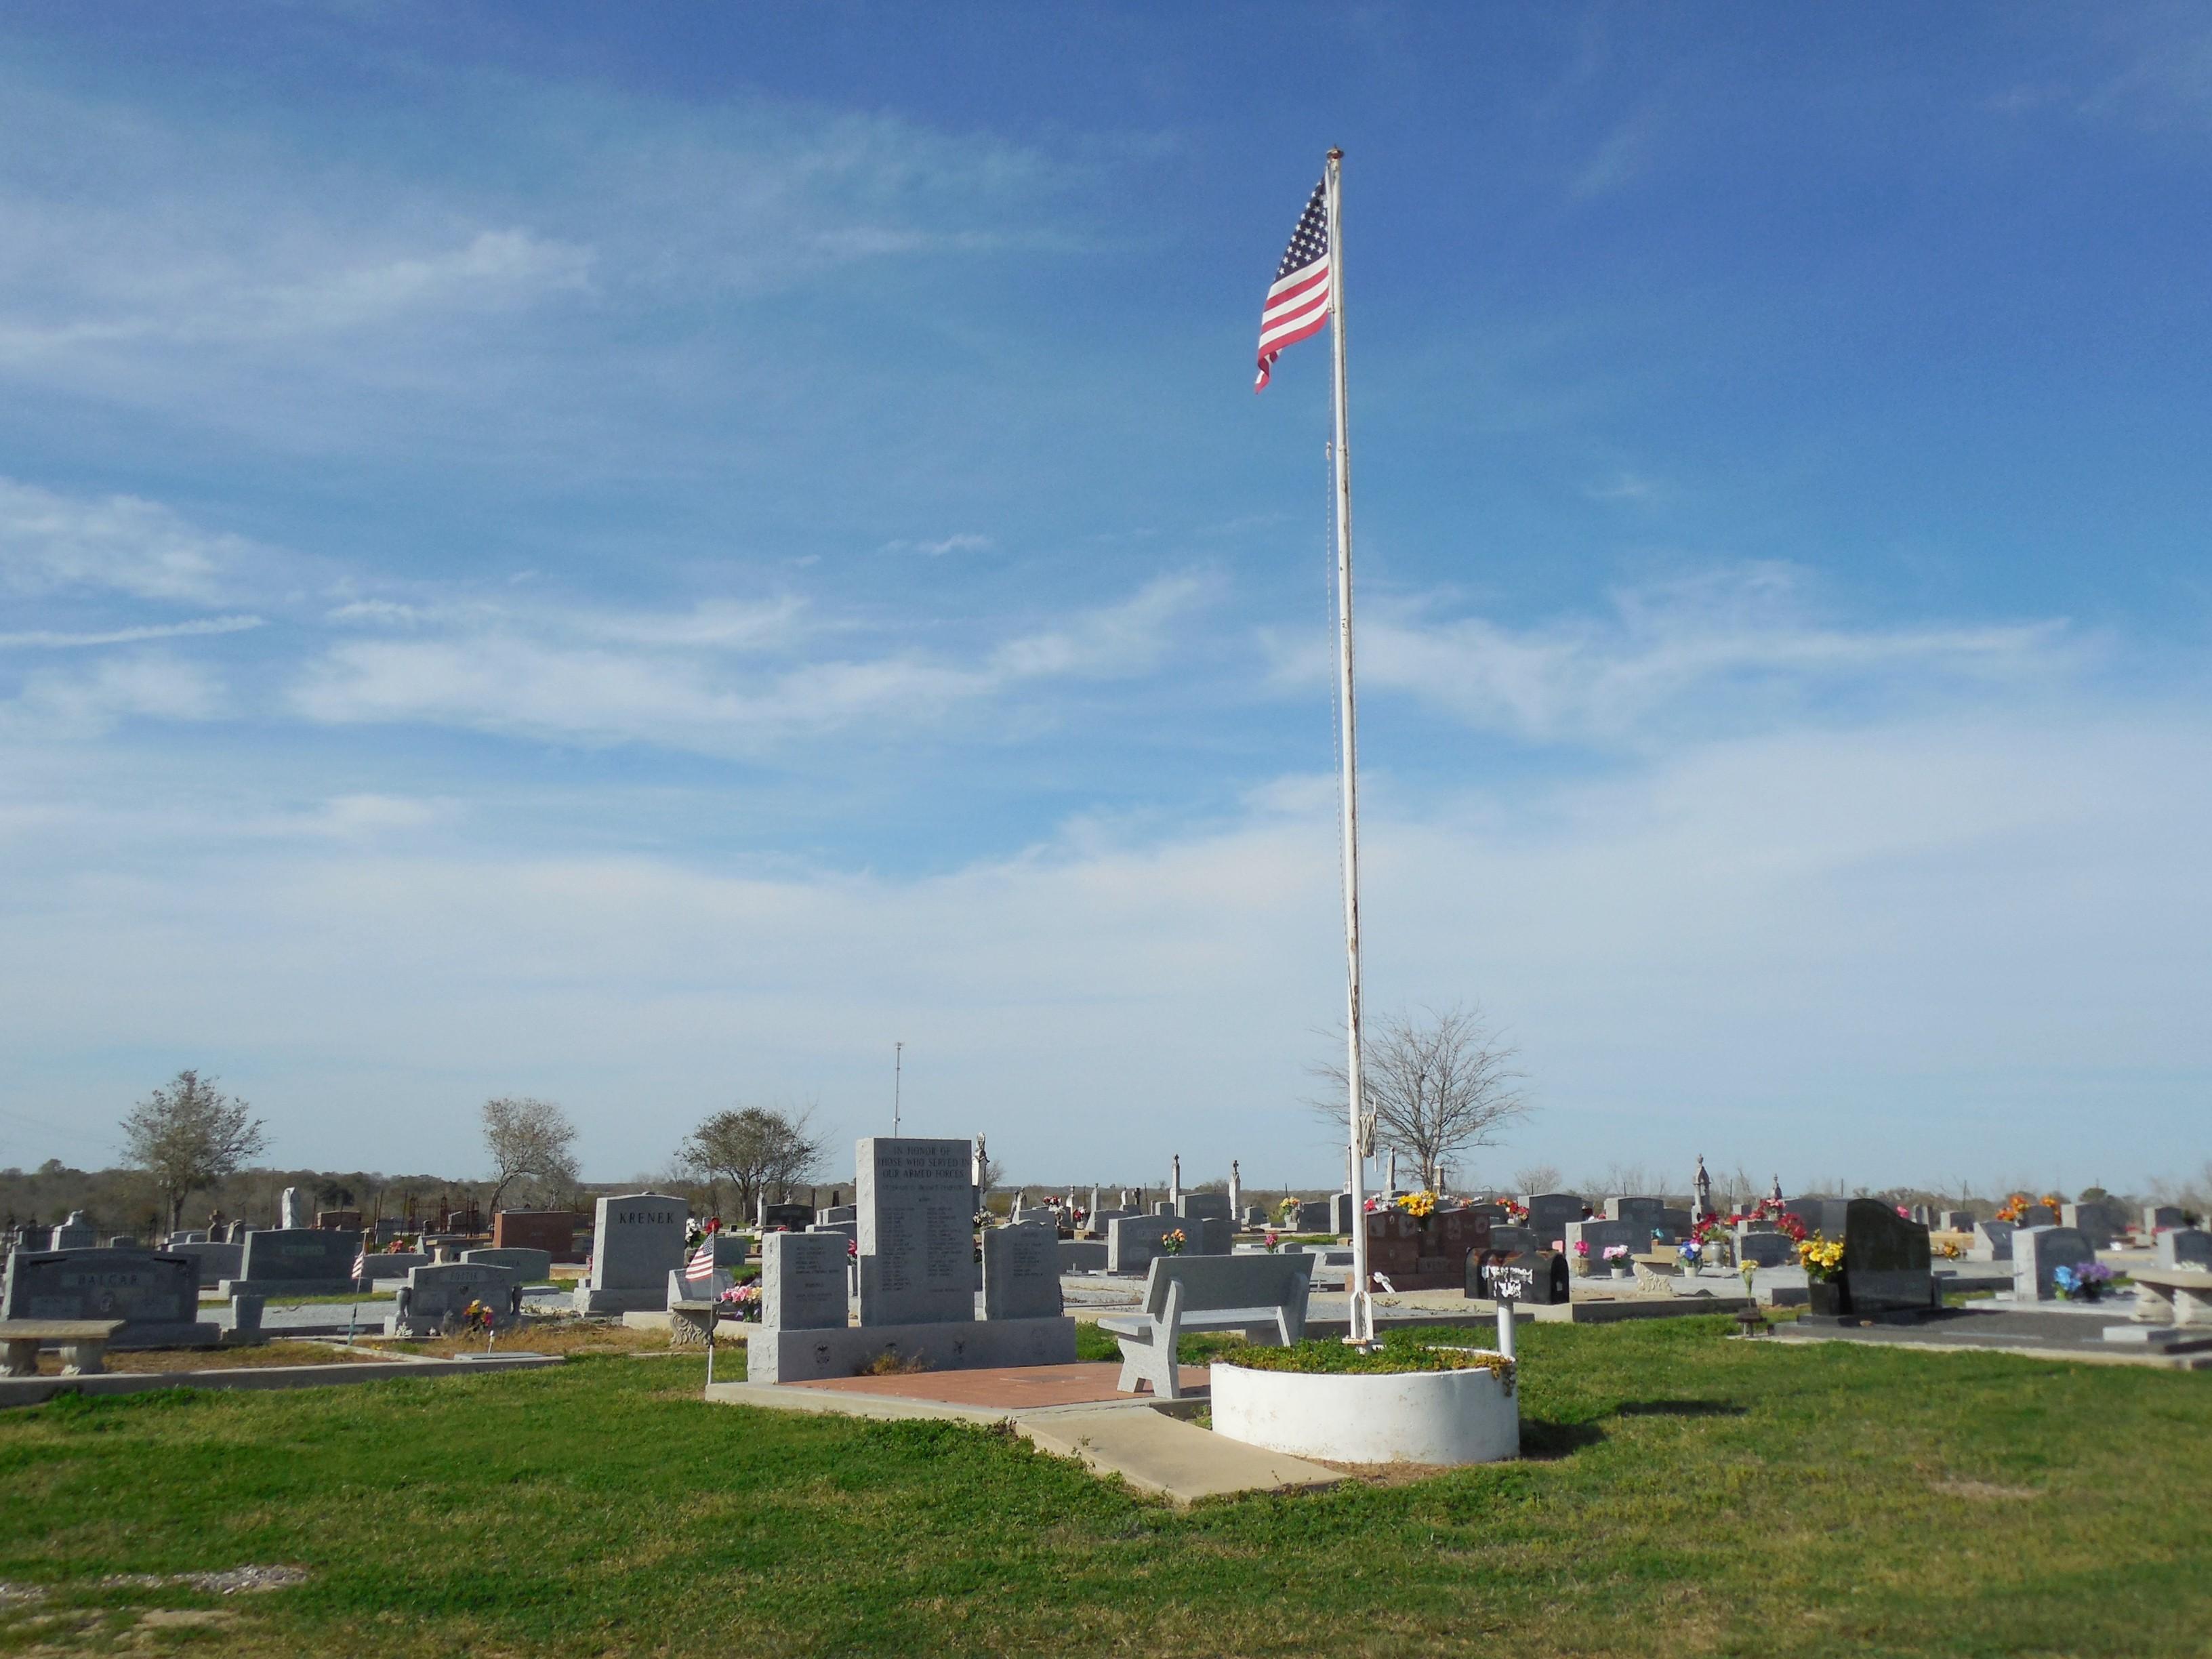 Hranice Cemetery